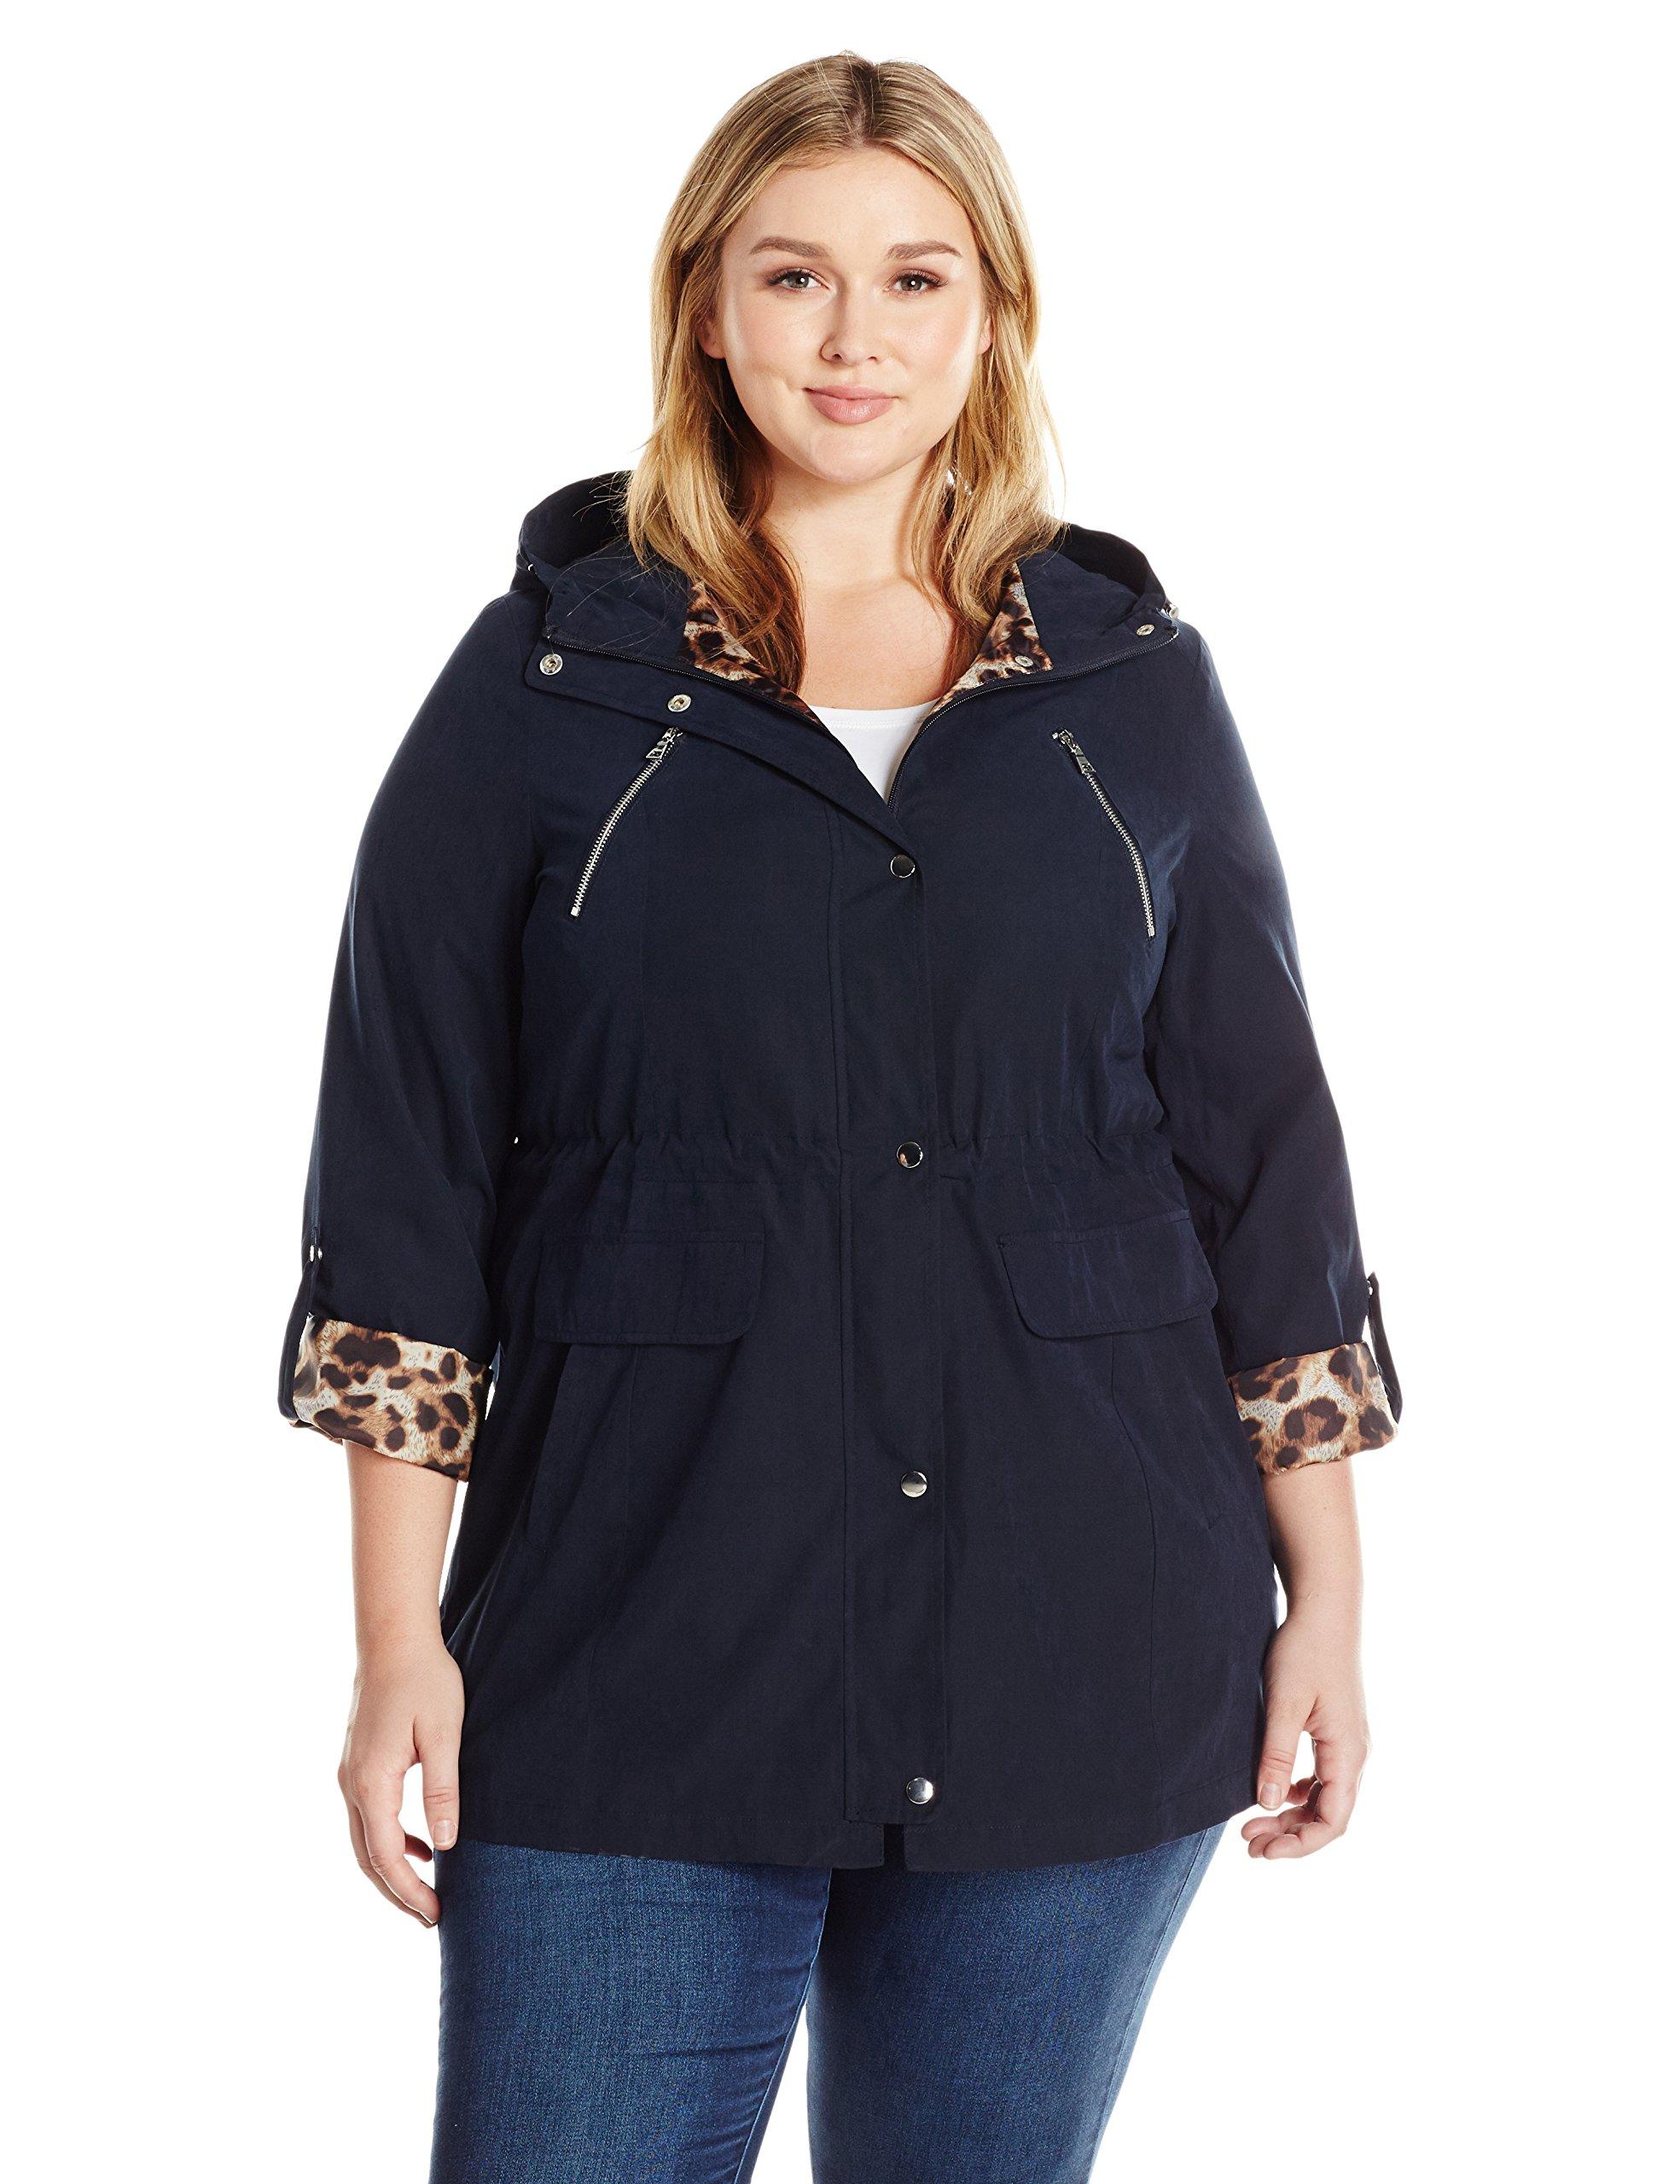 Lark & Ro Women's Size Utility Jacket Plus, Micronavy, 3 X